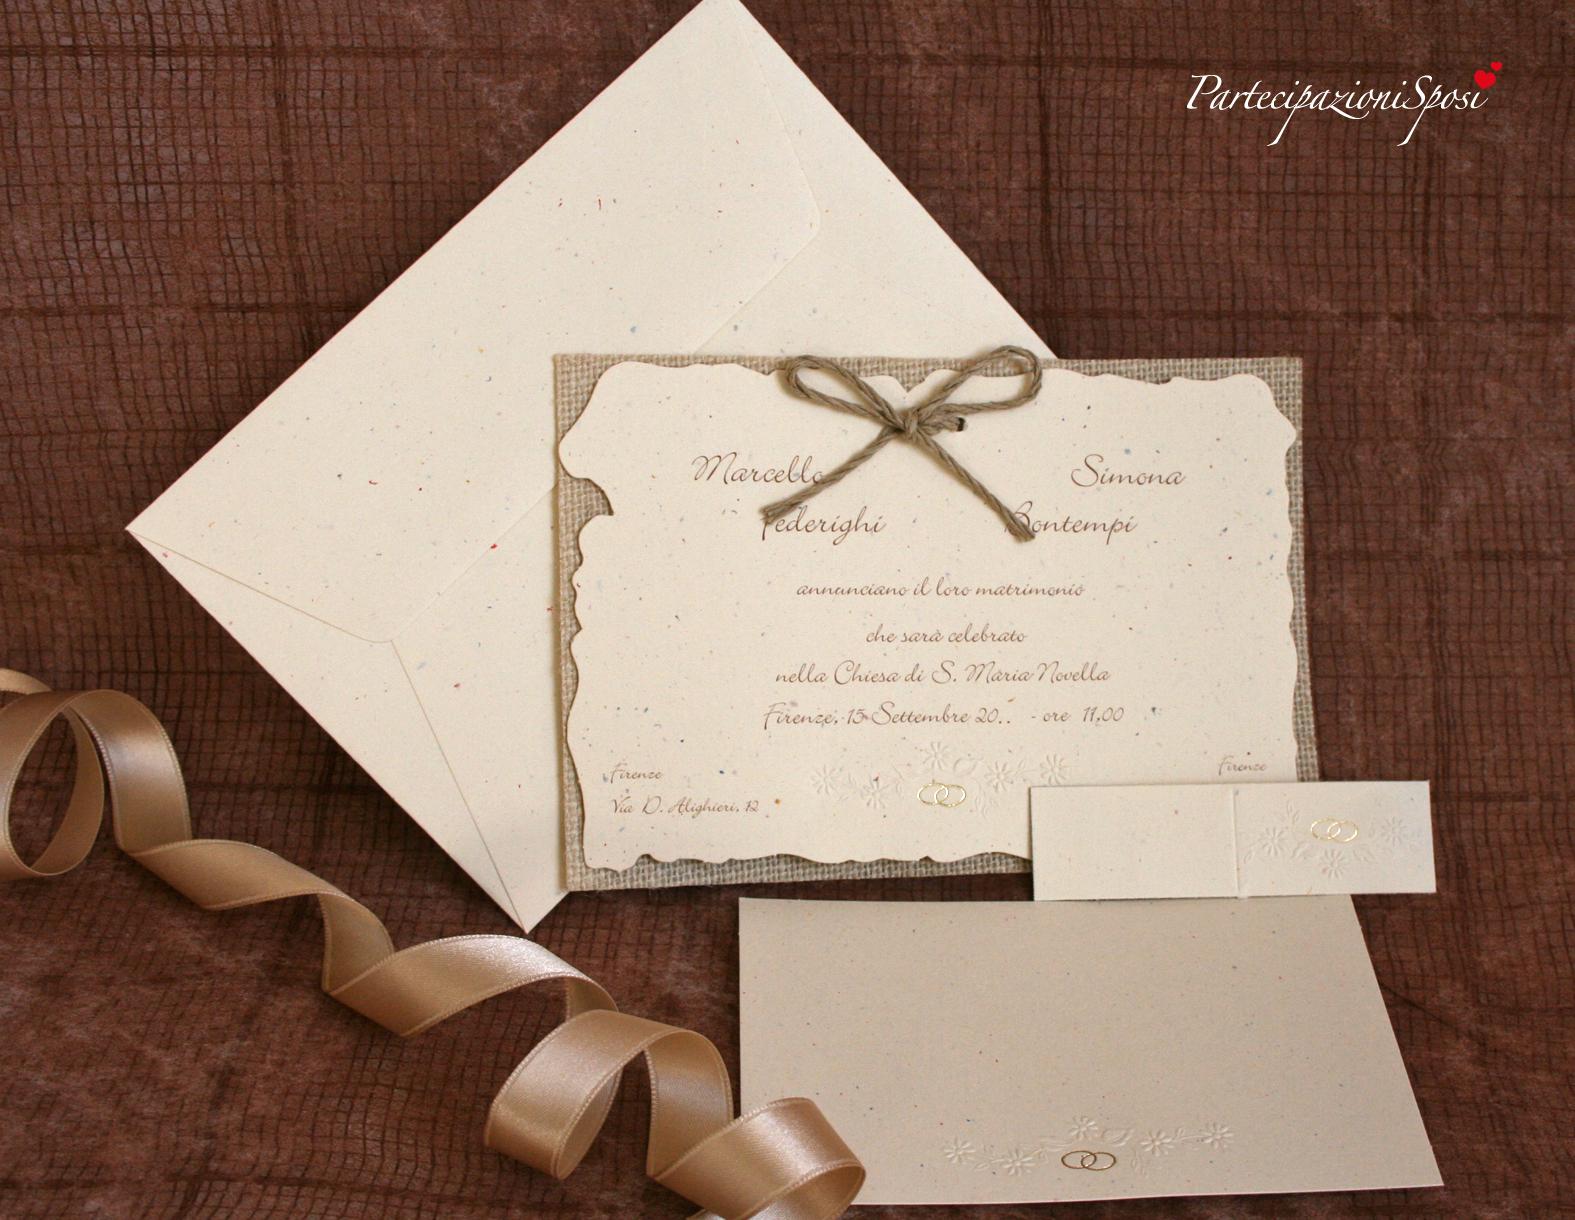 Shabby Chic Matrimonio Partecipazioni.Art 014 Partecipazioni Sposi Stampa Partecipazioni Matrimonio